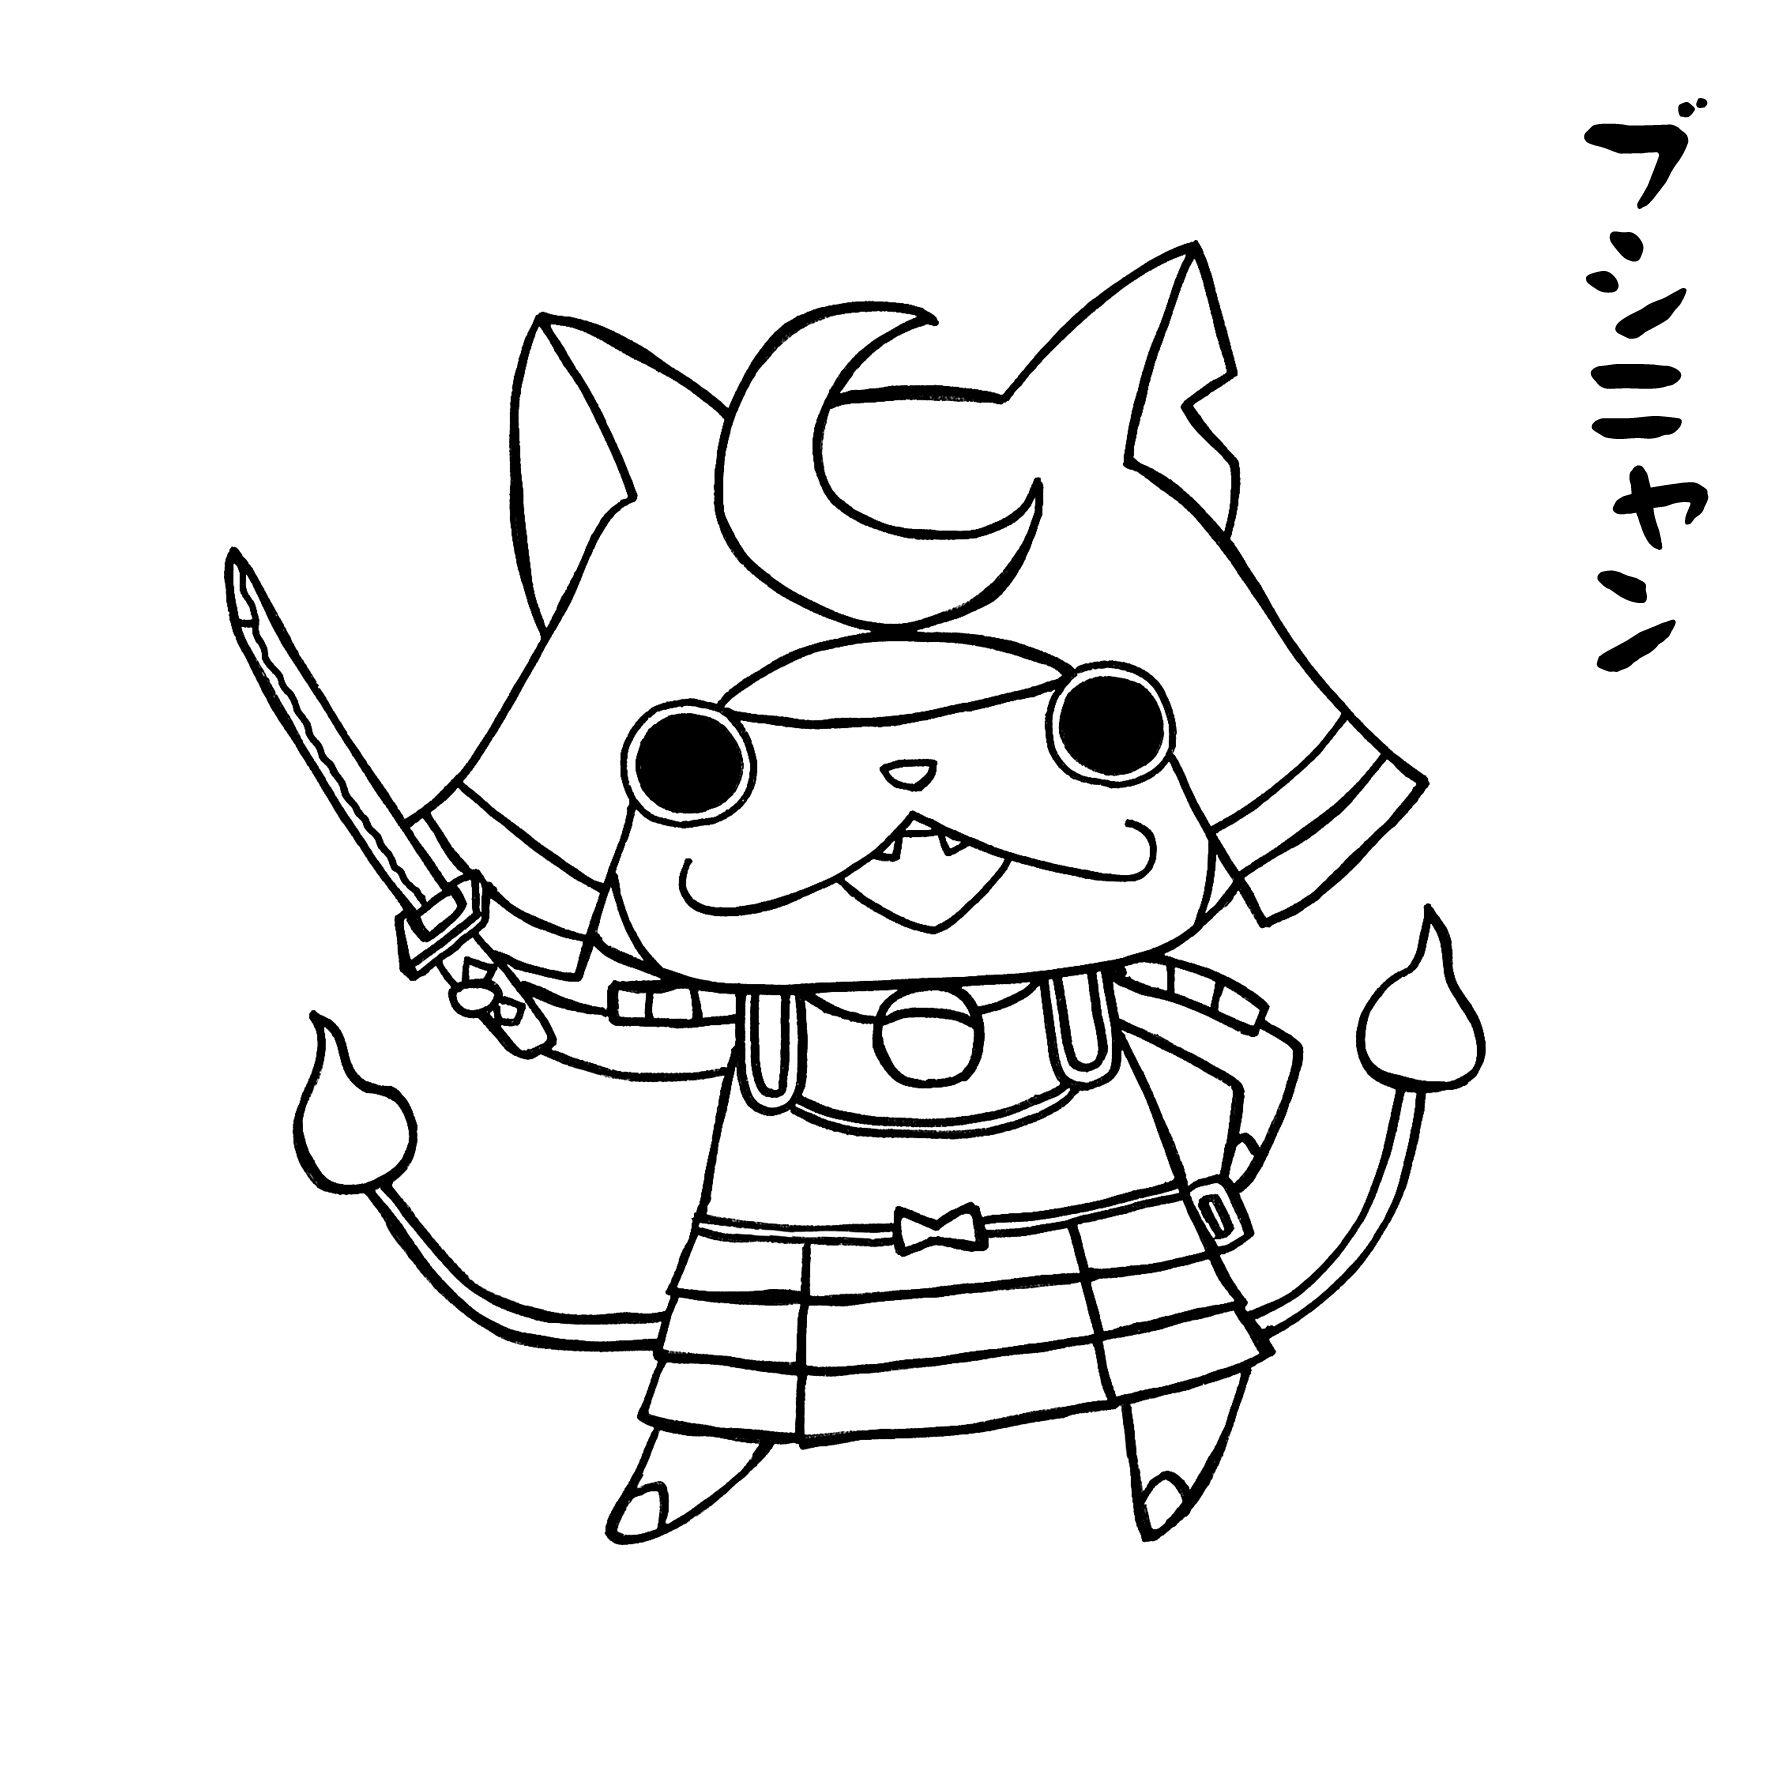 pin by luluna huang on 妖怪ウォッチぬりえ vault boy character sonic the hedgehog